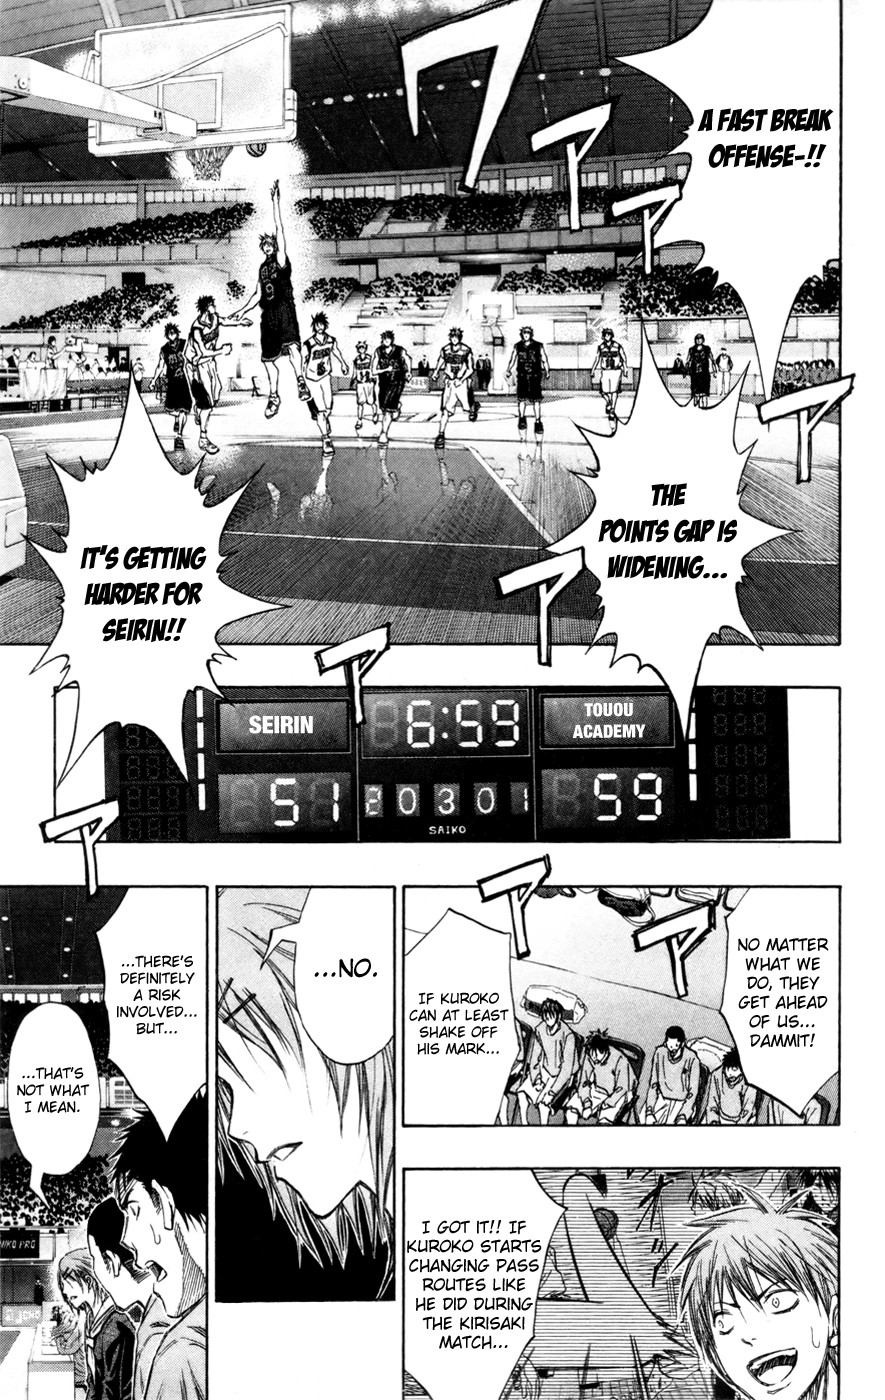 Kuroko no Basket Manga Chapter 127 - Image 21